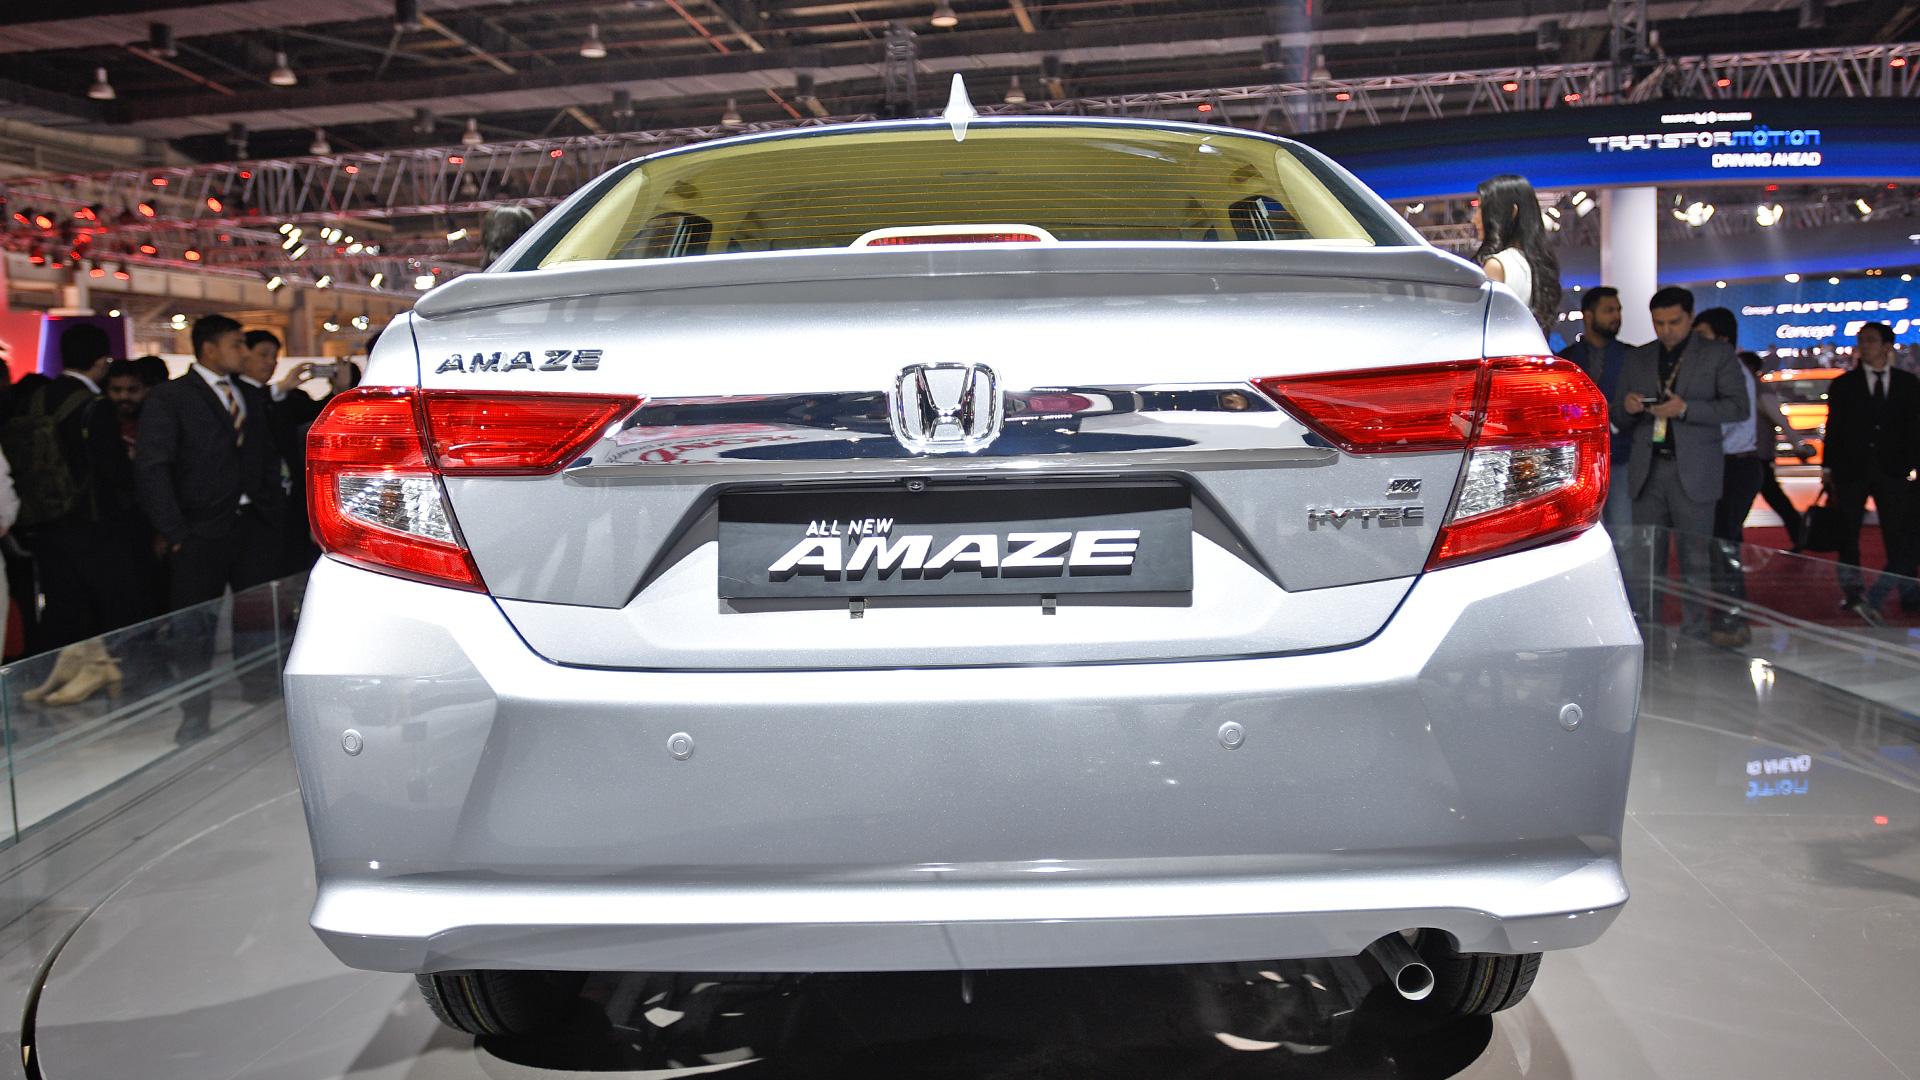 Honda Amaze 2019 S Cvt Price Mileage Reviews Specification